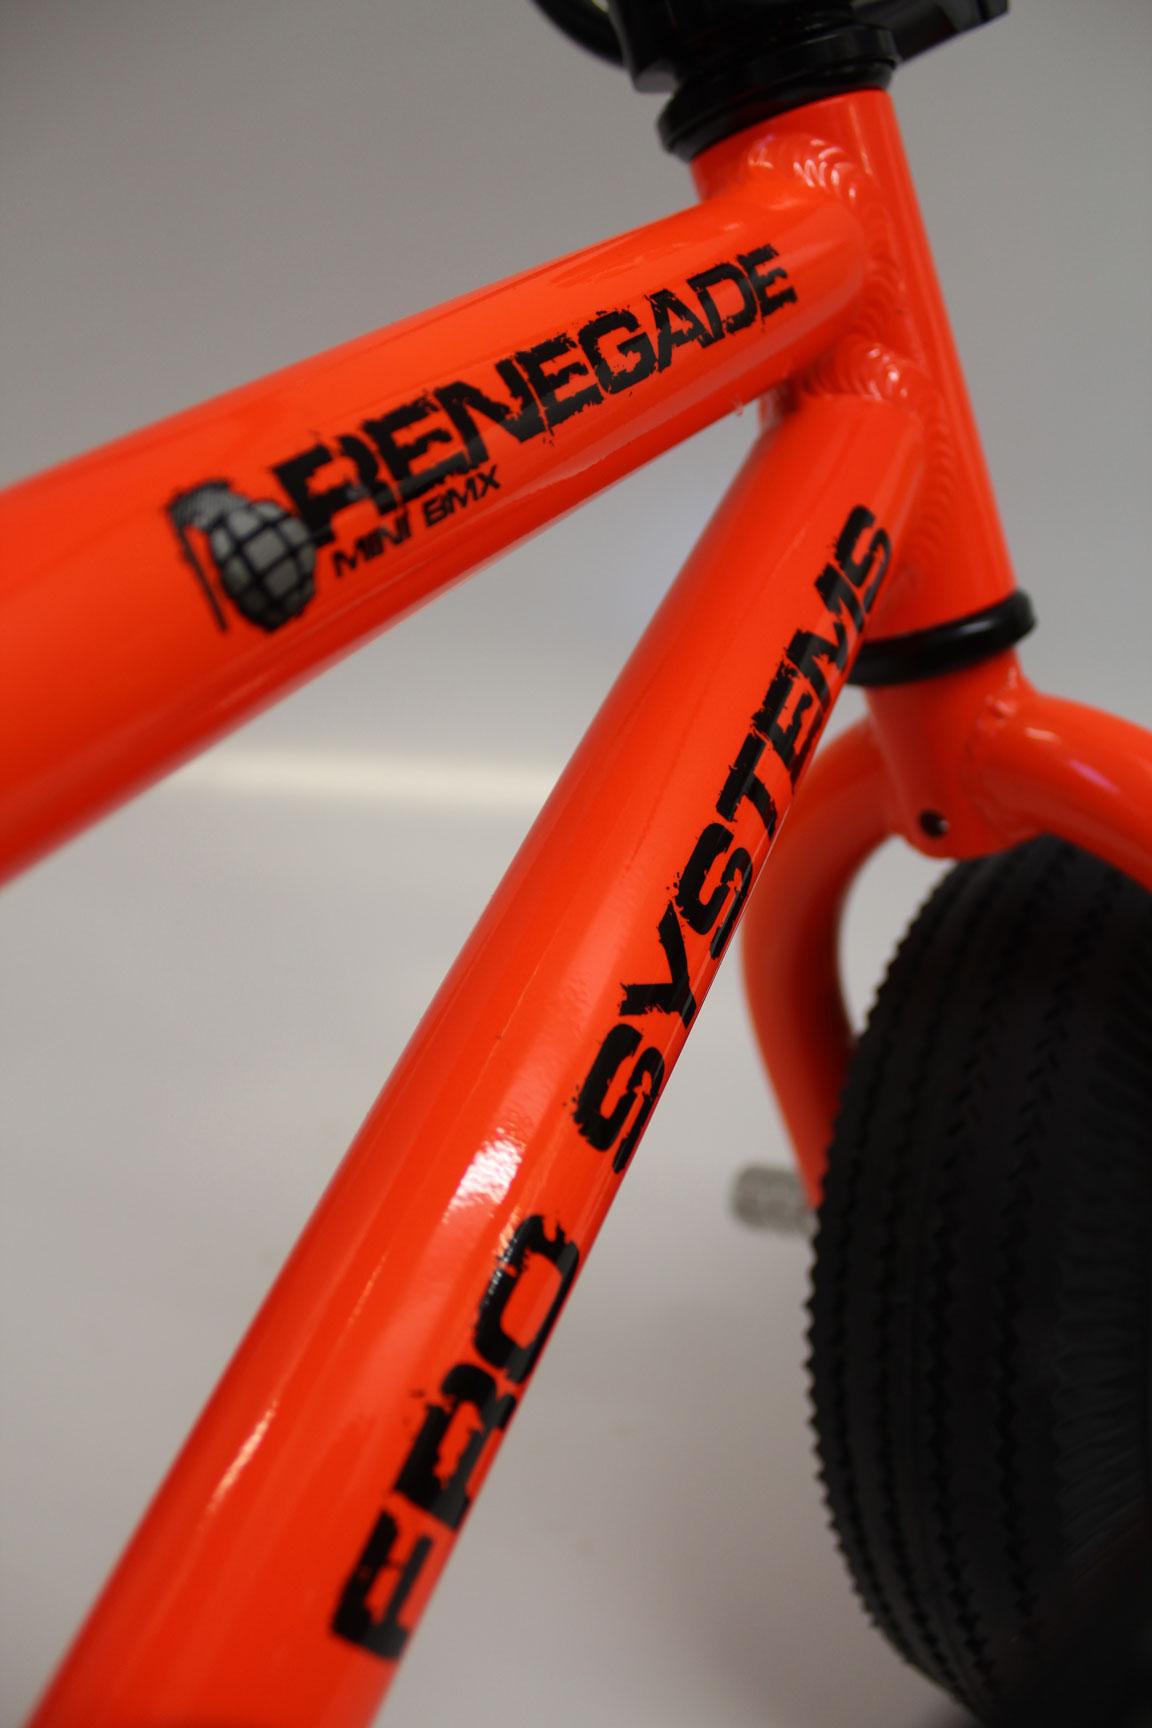 Renegade Race Fuel >> Accessories & Parts - Renegade Mini BMX - Renegade - Orange - FRO Systems - Adrenaline Sports ...